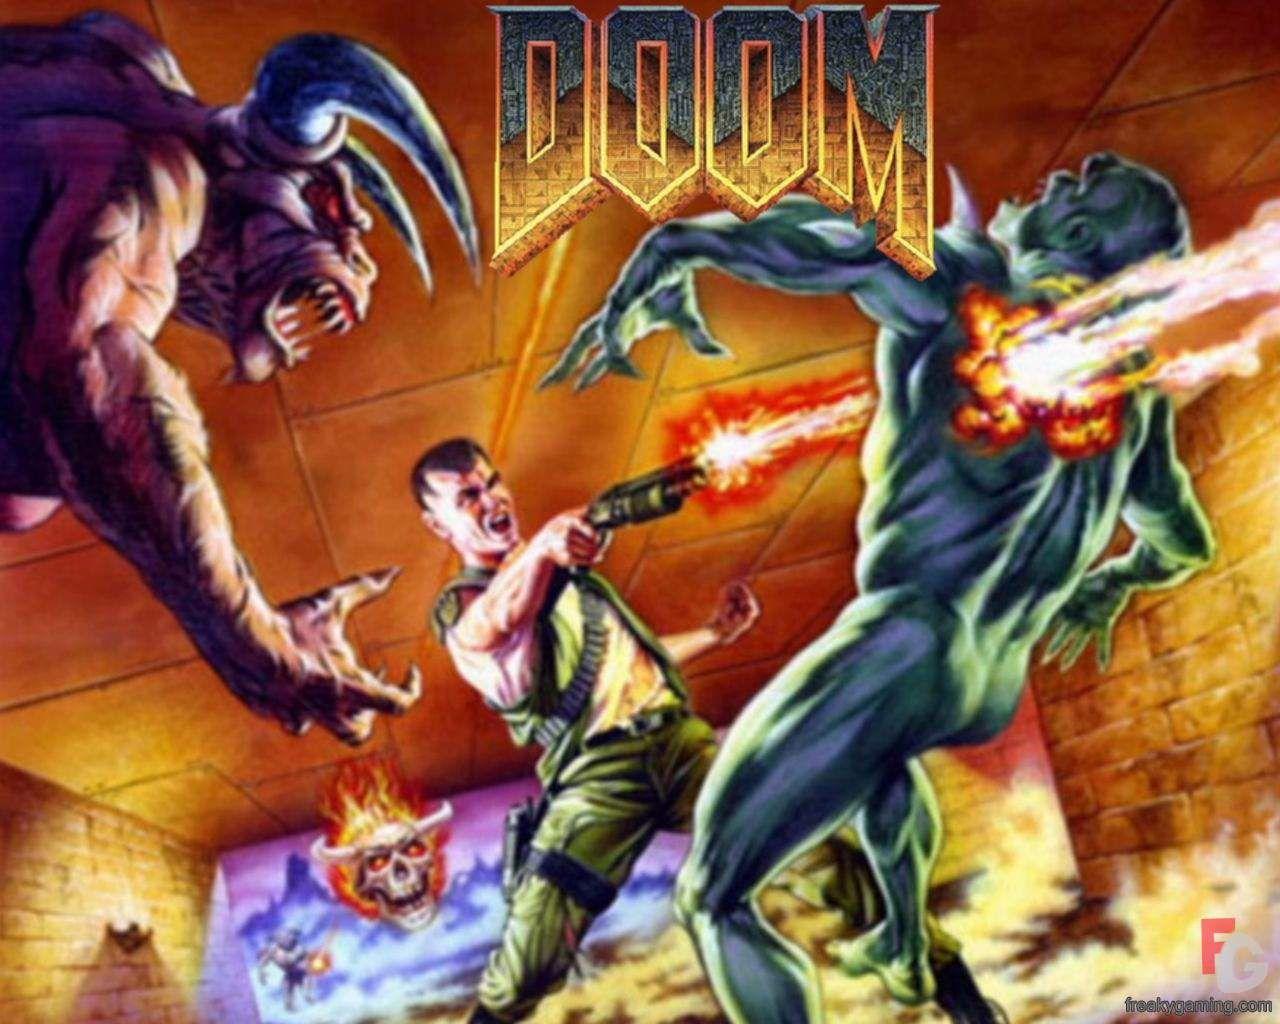 Undefined Doom 2 Wallpapers 40 Wallpapers Adorable Wallpapers Wallpaper Doom 2 Art